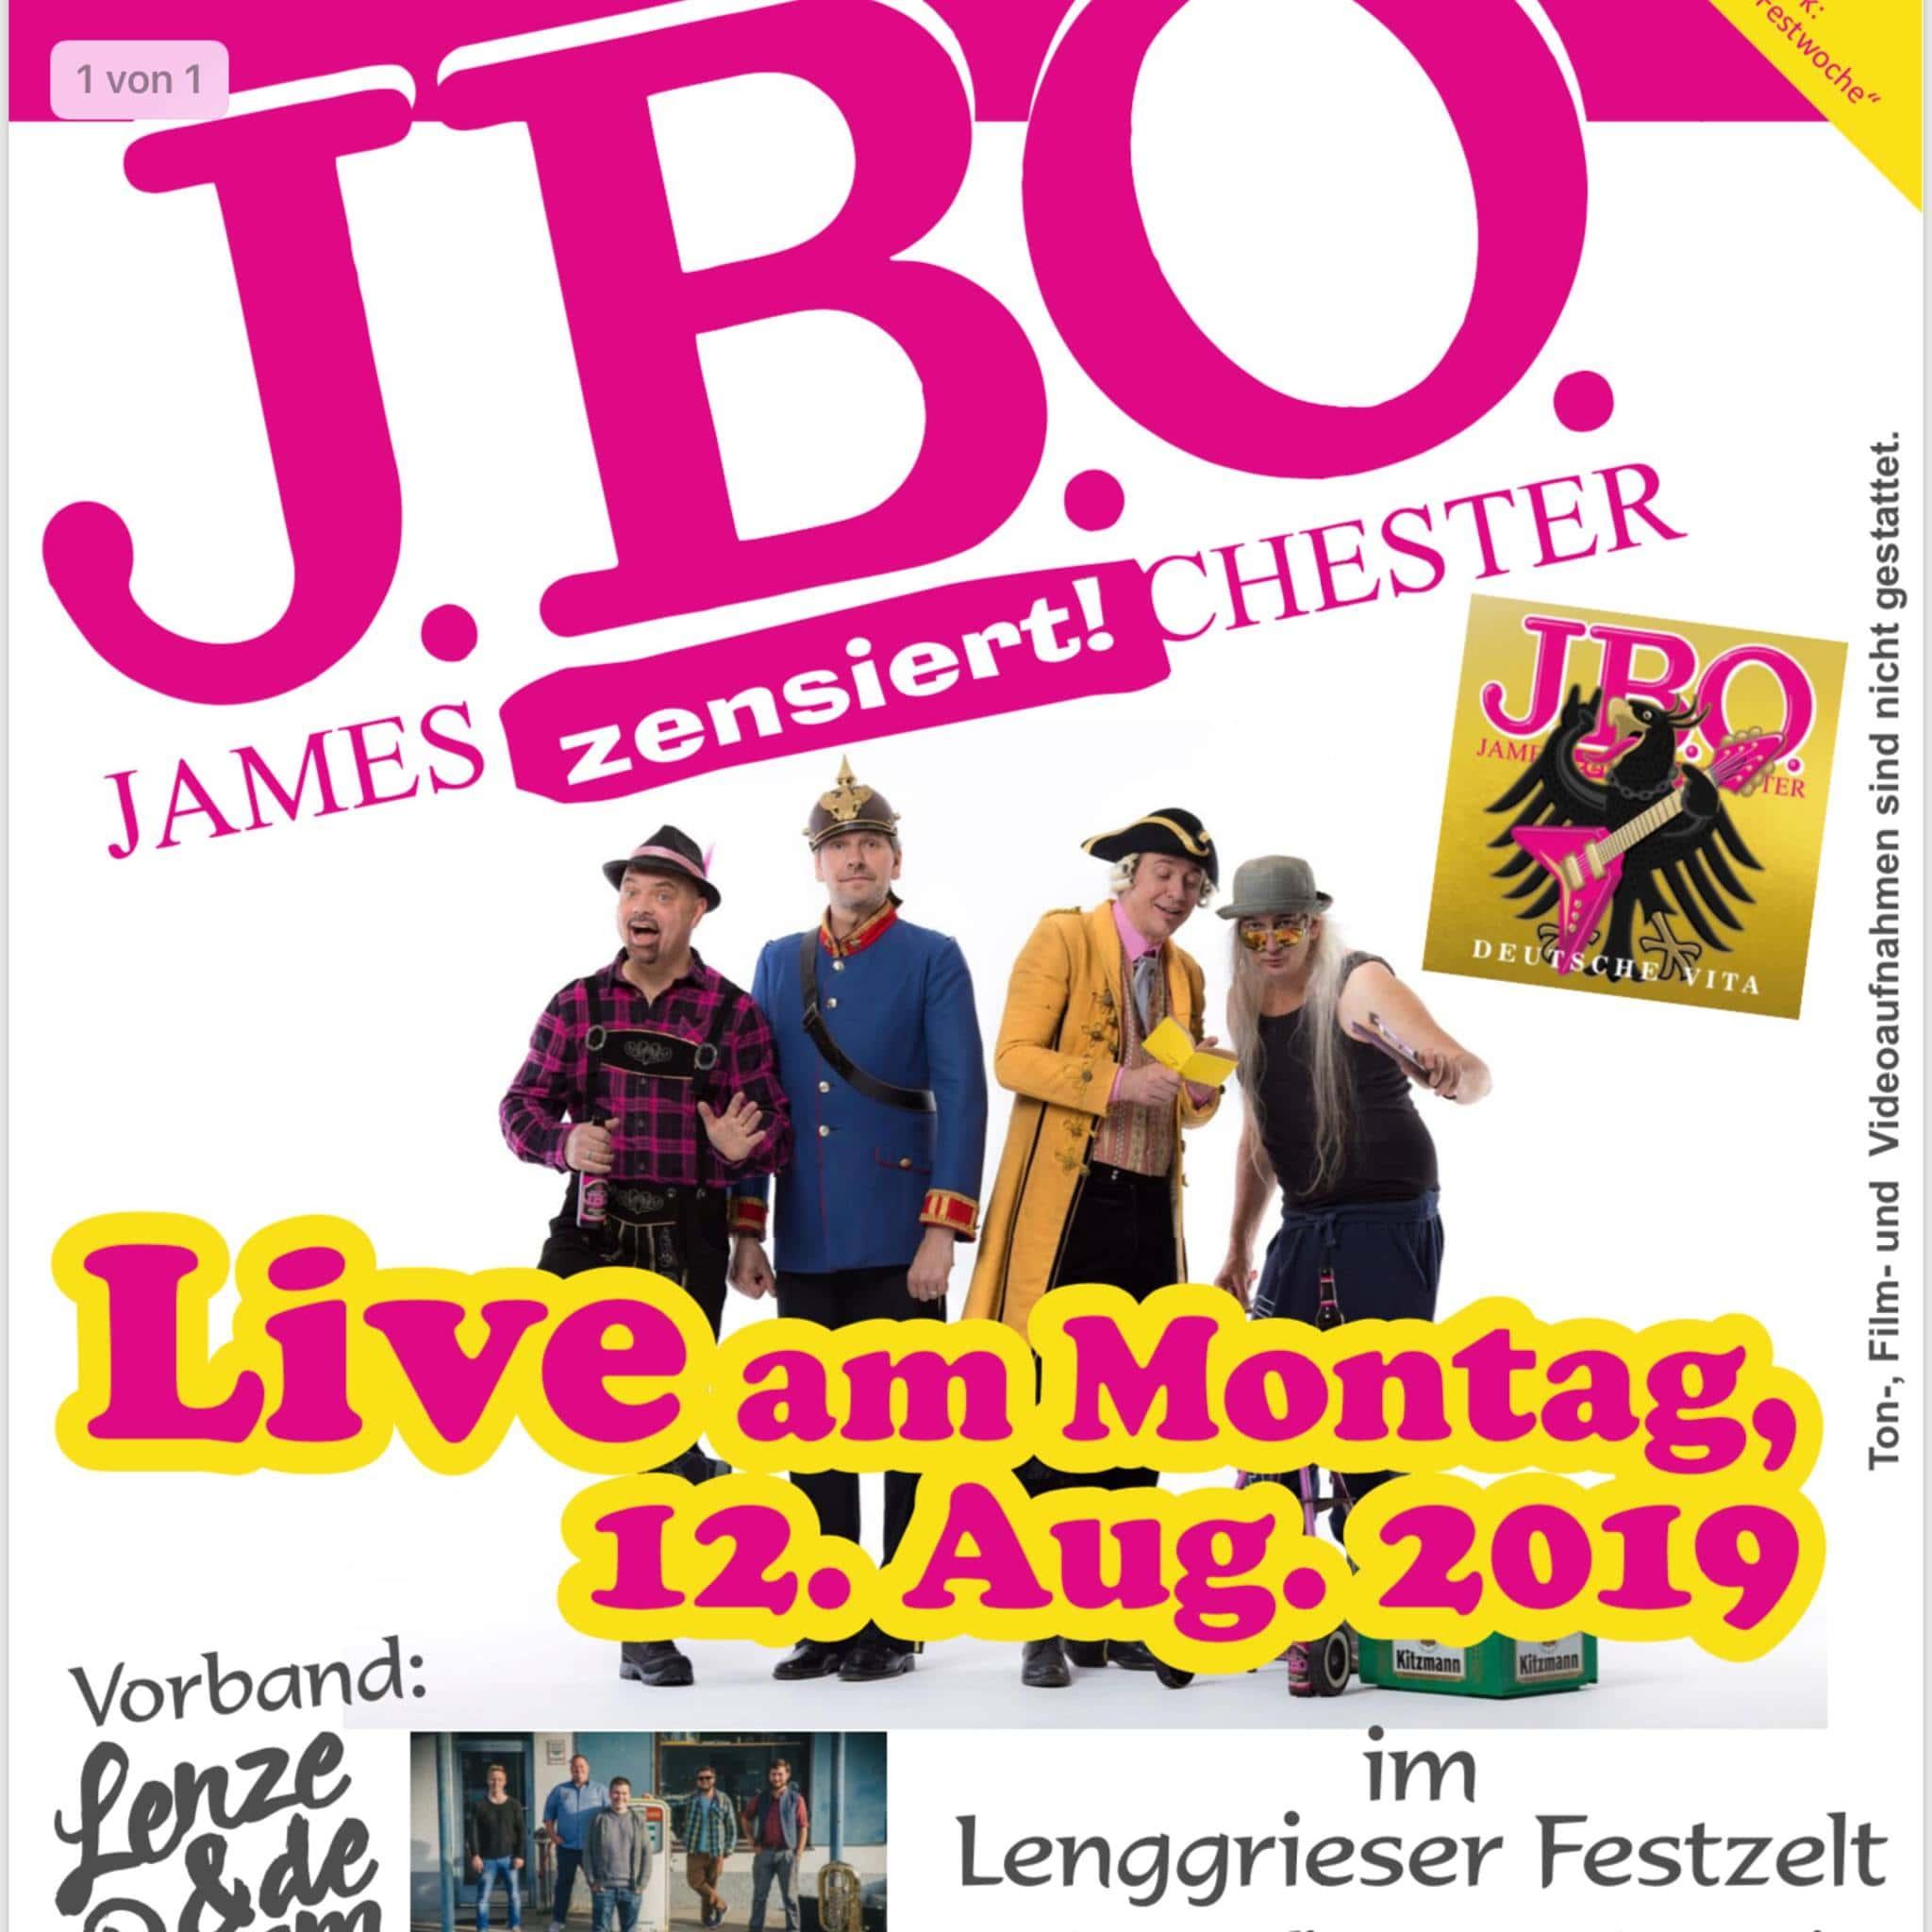 12.08.19 - Lenggrieser-Festwoche, Lenggries